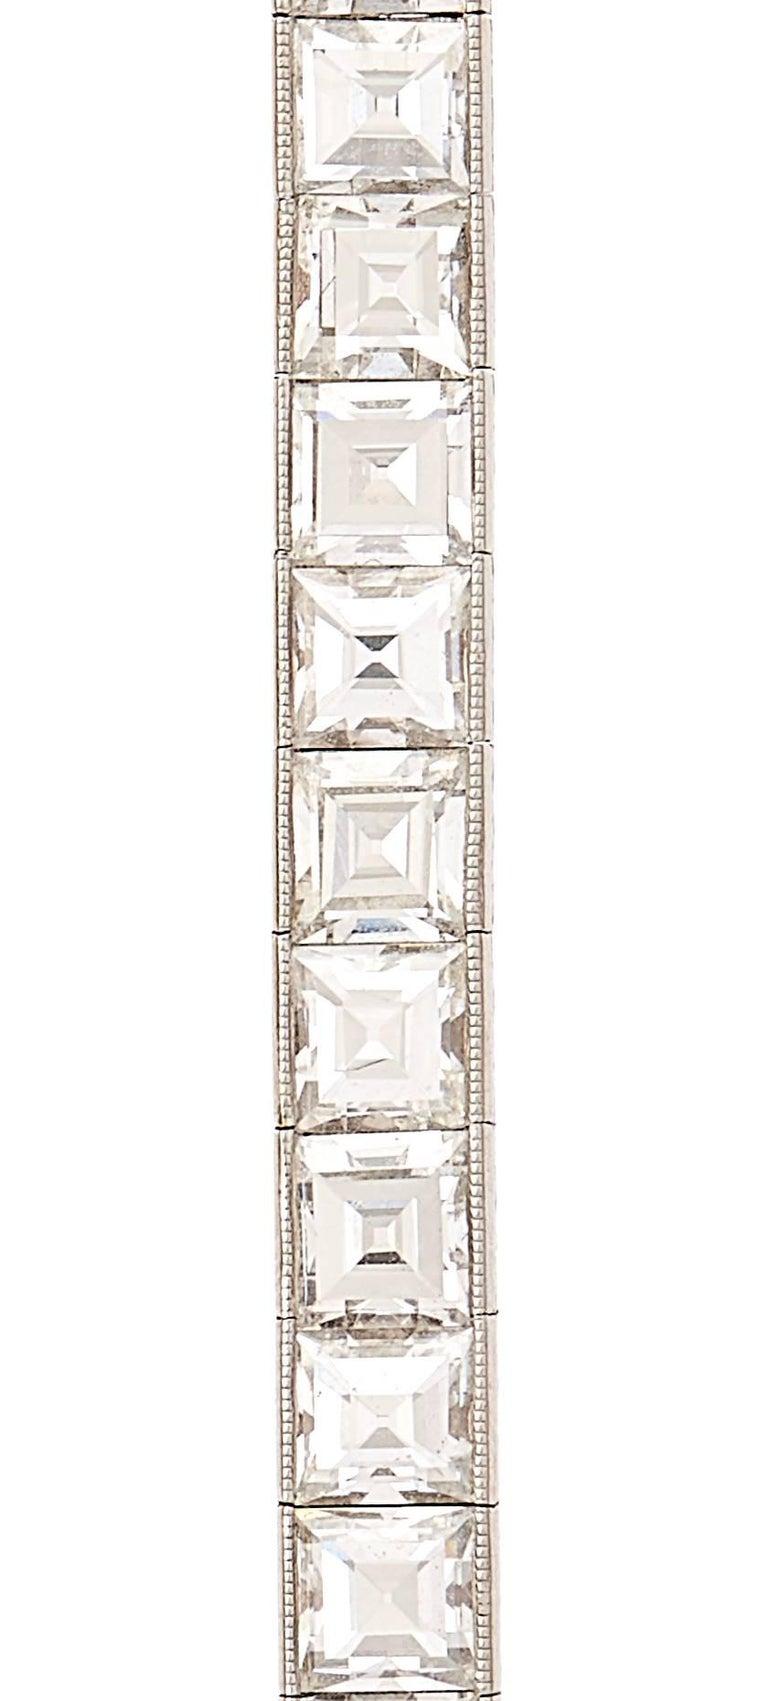 Art Deco 14 Carat Emerald Cut Diamond Platinum Line Bracelet In Excellent Condition For Sale In New York, NY